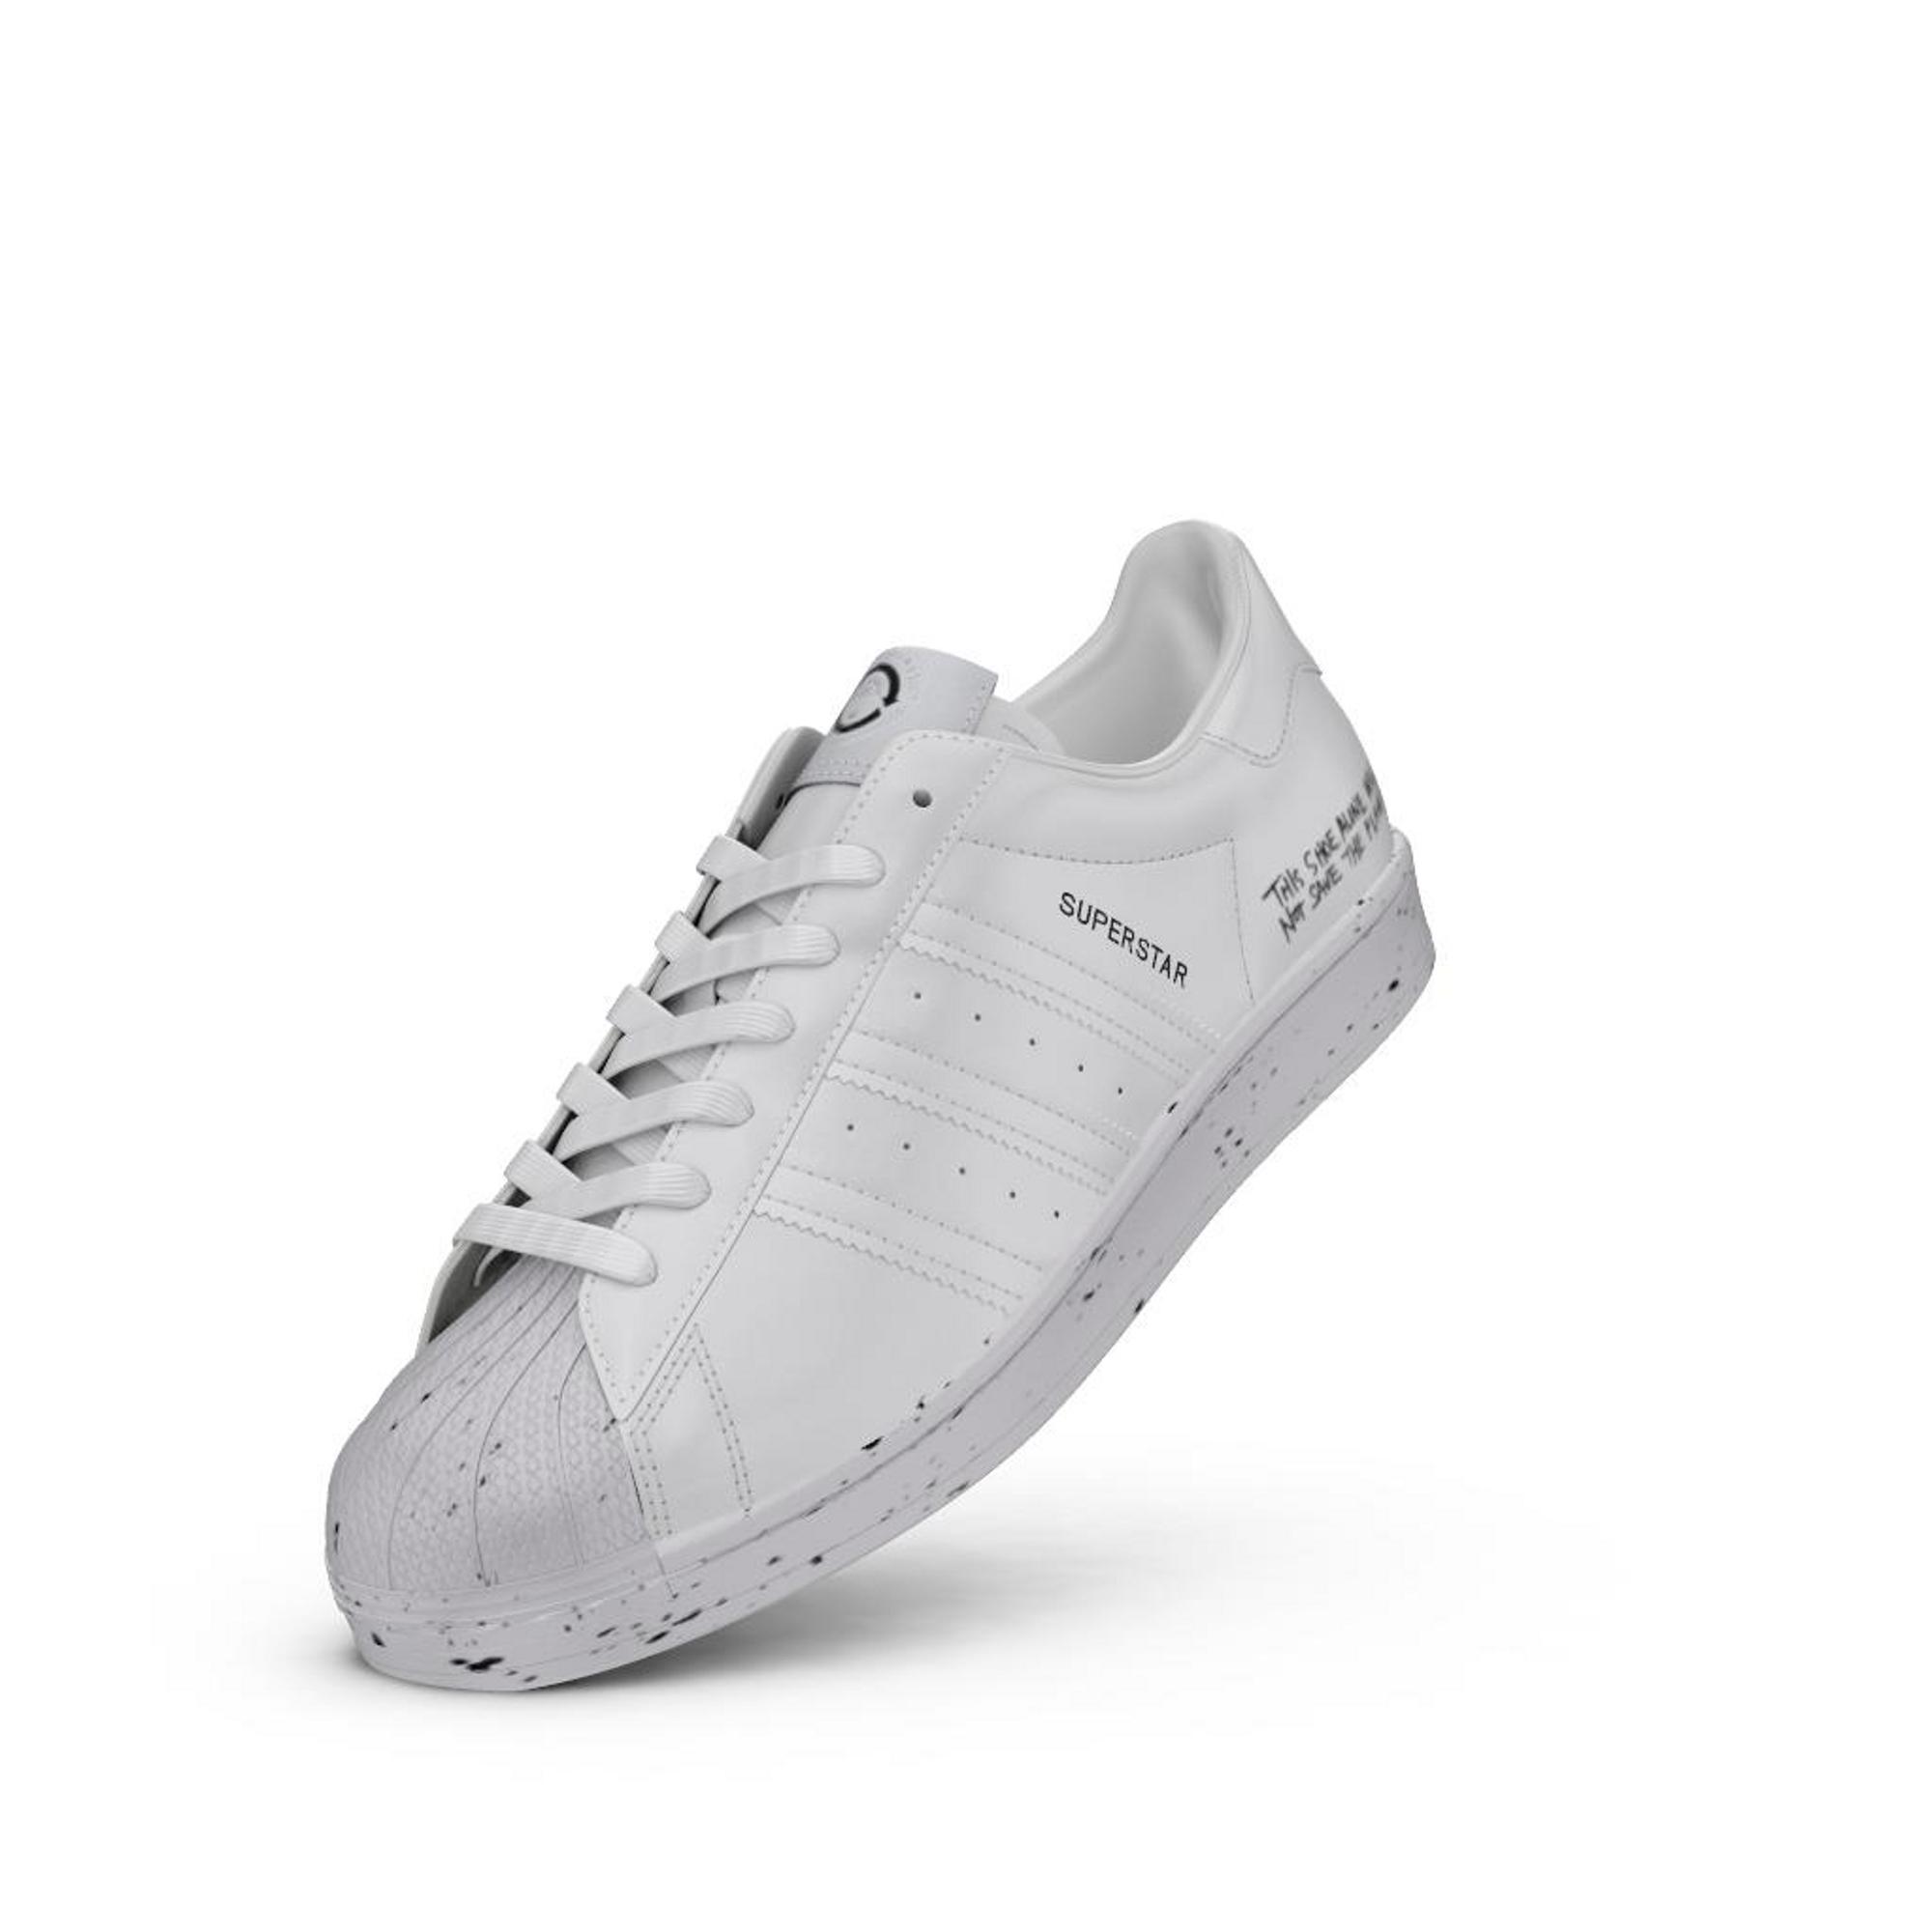 adidas Superstar Clean Classics Ftw White/ Ftw White/ Core Black